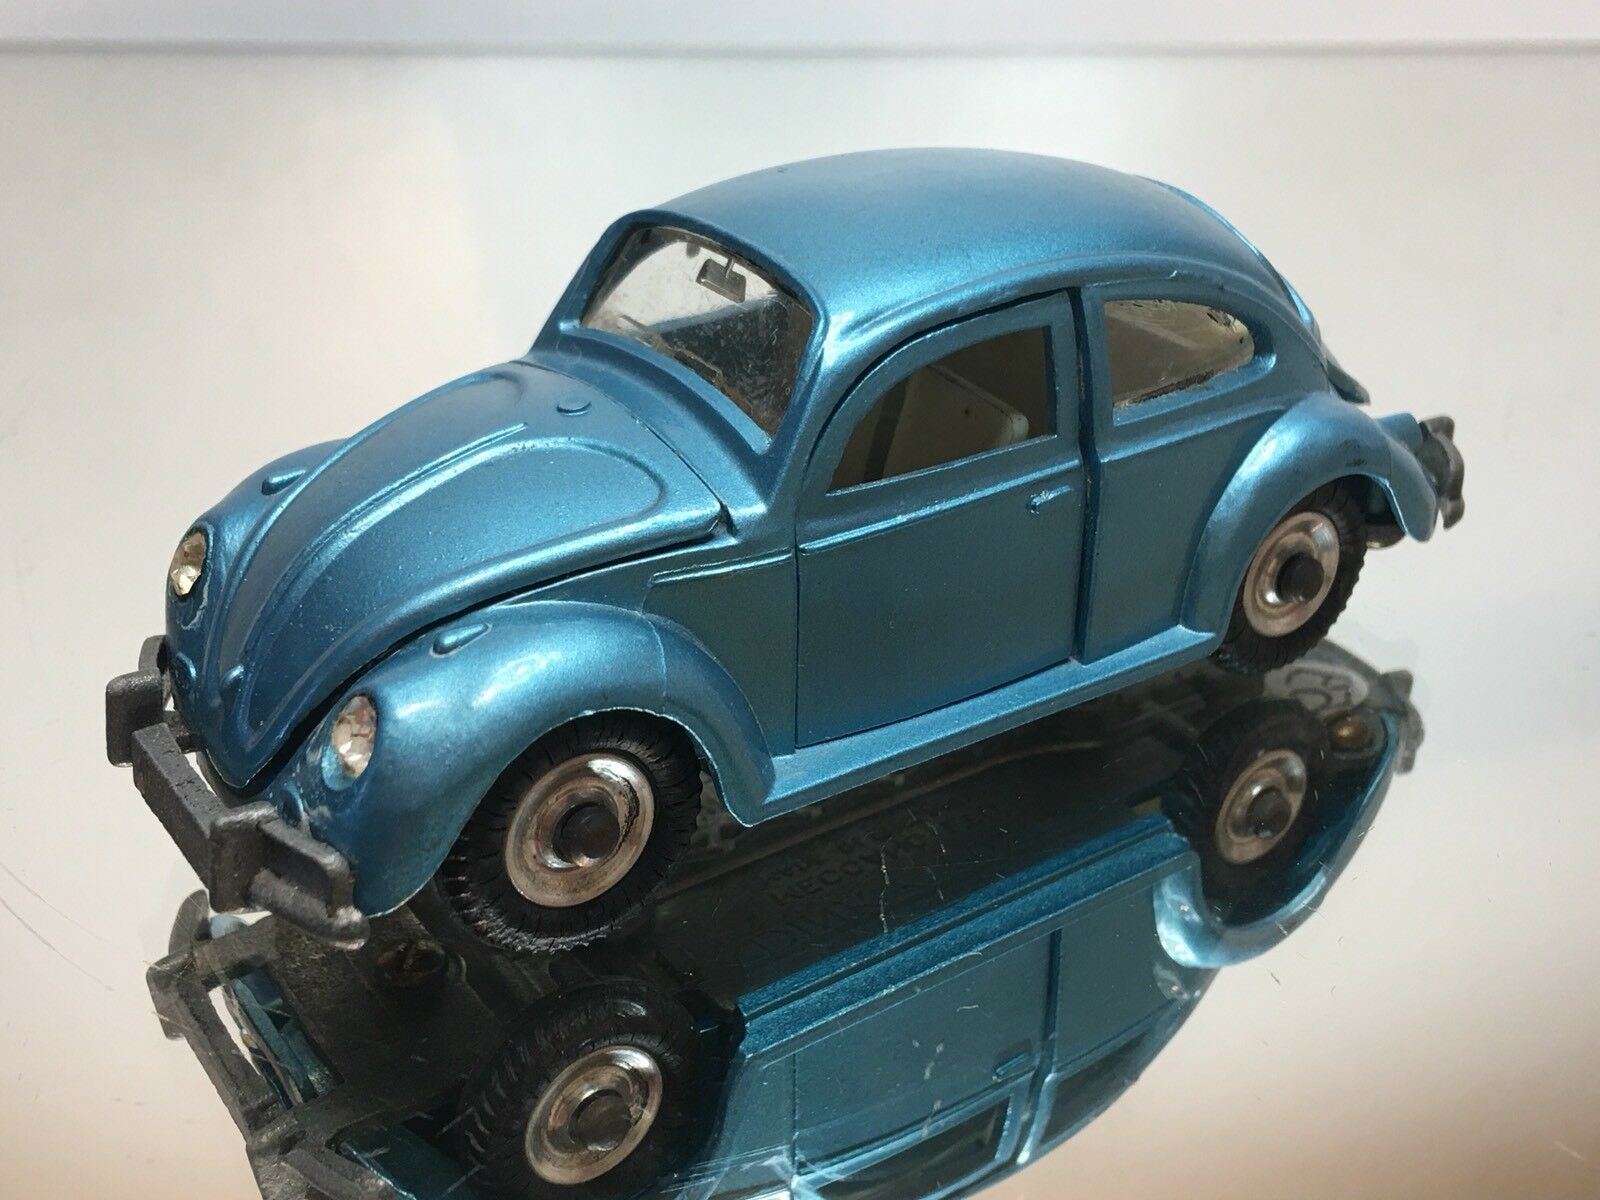 DINKY TOYS 129 129 129 VW VOLKSWAGEN BEETLE 1300 - azul 1 43 - GOOD CONDITION d255cc